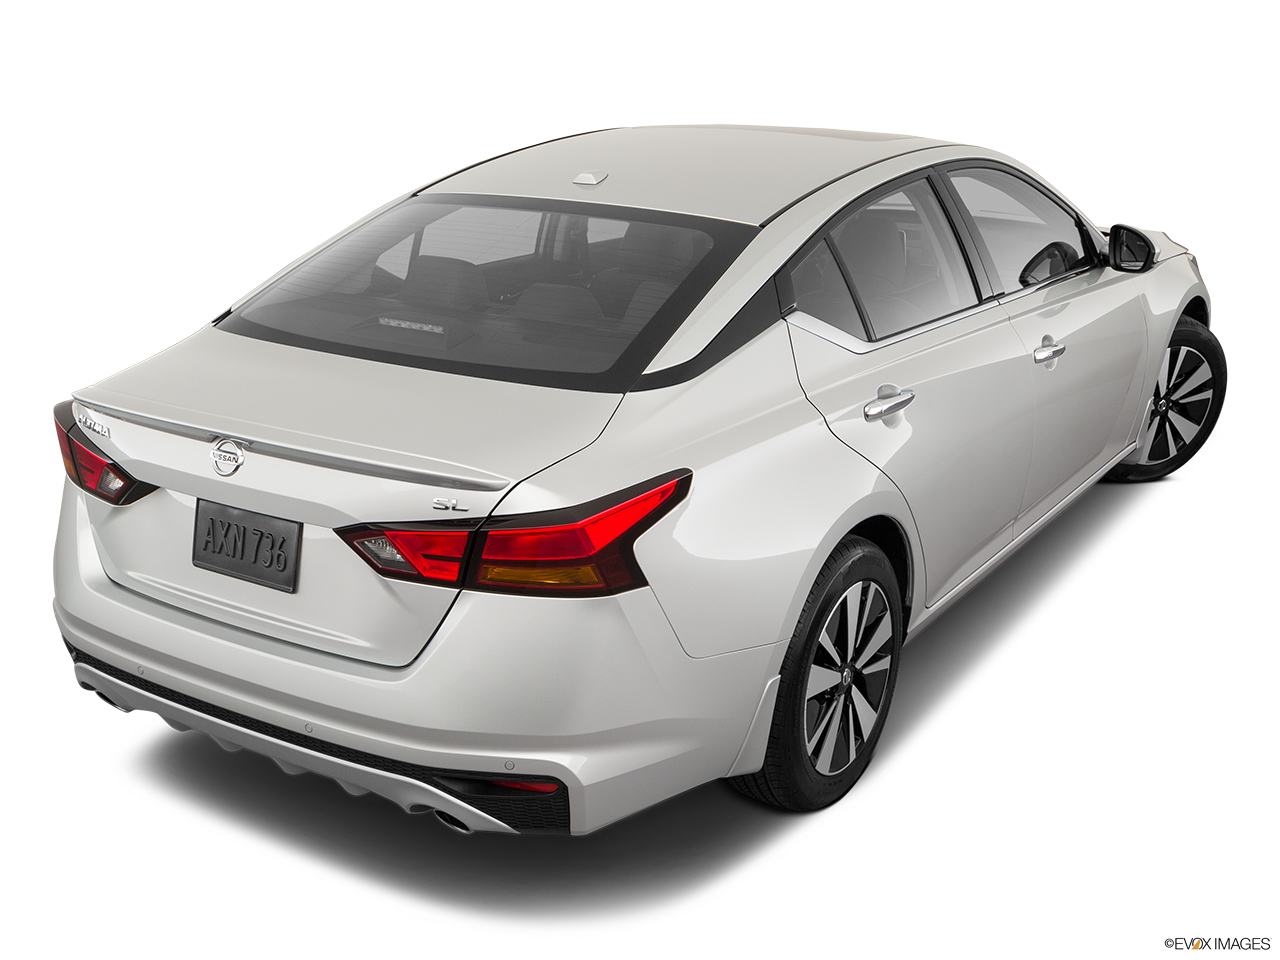 Nissan Altima 2020 2.5 S, United Arab Emirates